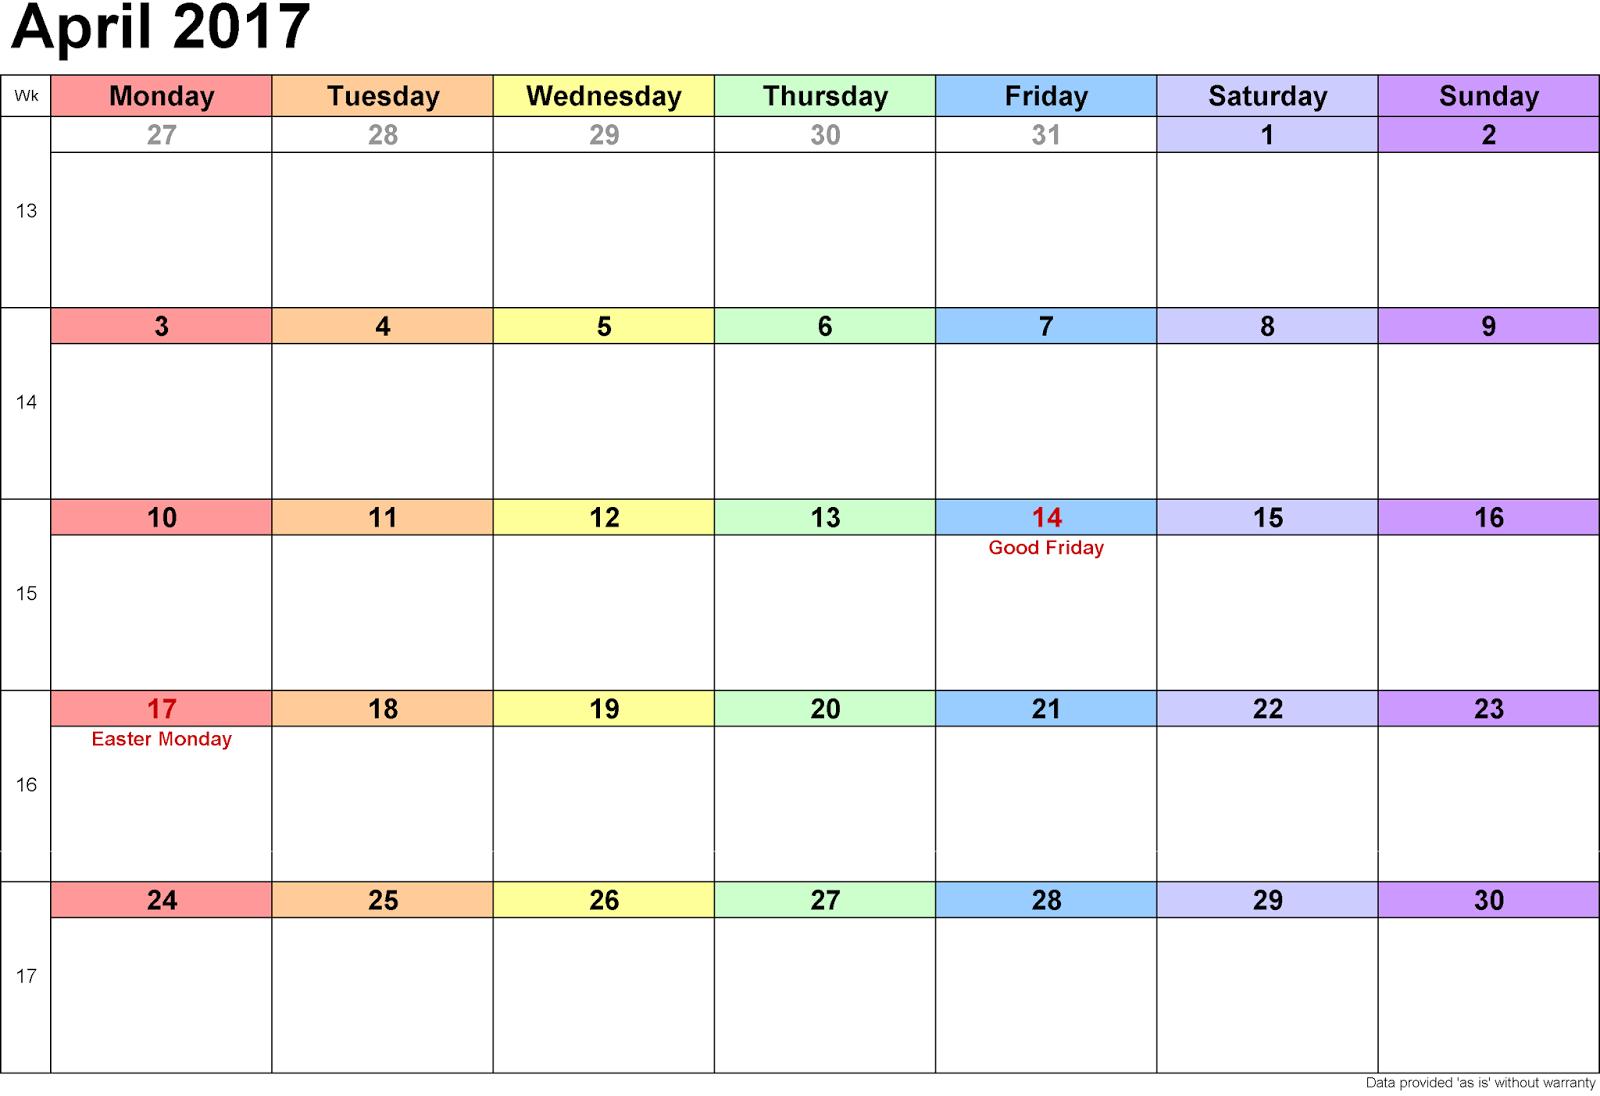 April 2017 Printable Calendar | April 2017 Calendar Template Free ...